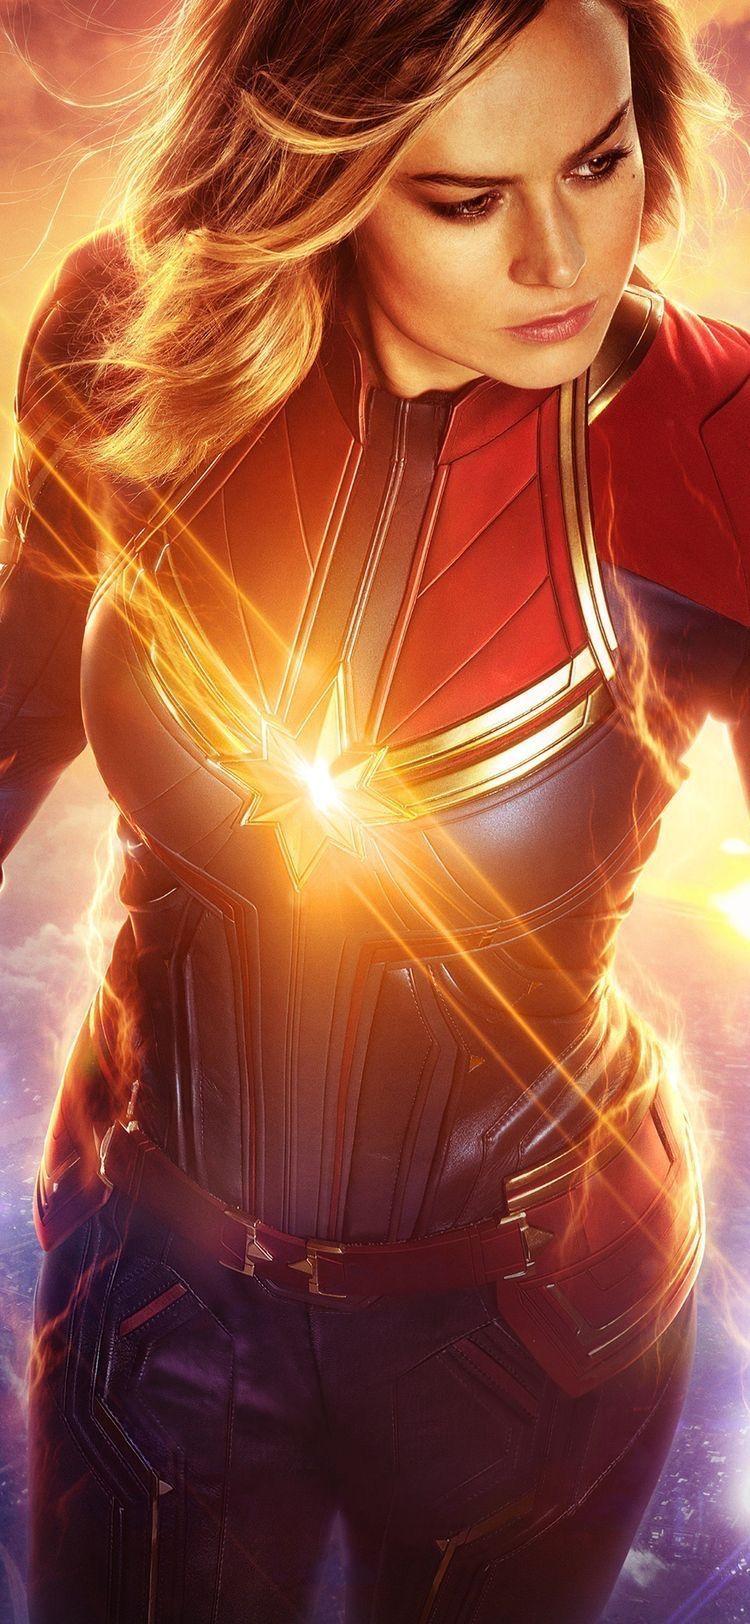 A Year In Film 2019 A Movie Trailer Mashup Strange Harbors In 2020 Marvel 4k Captain Marvel Marvel Superheroes